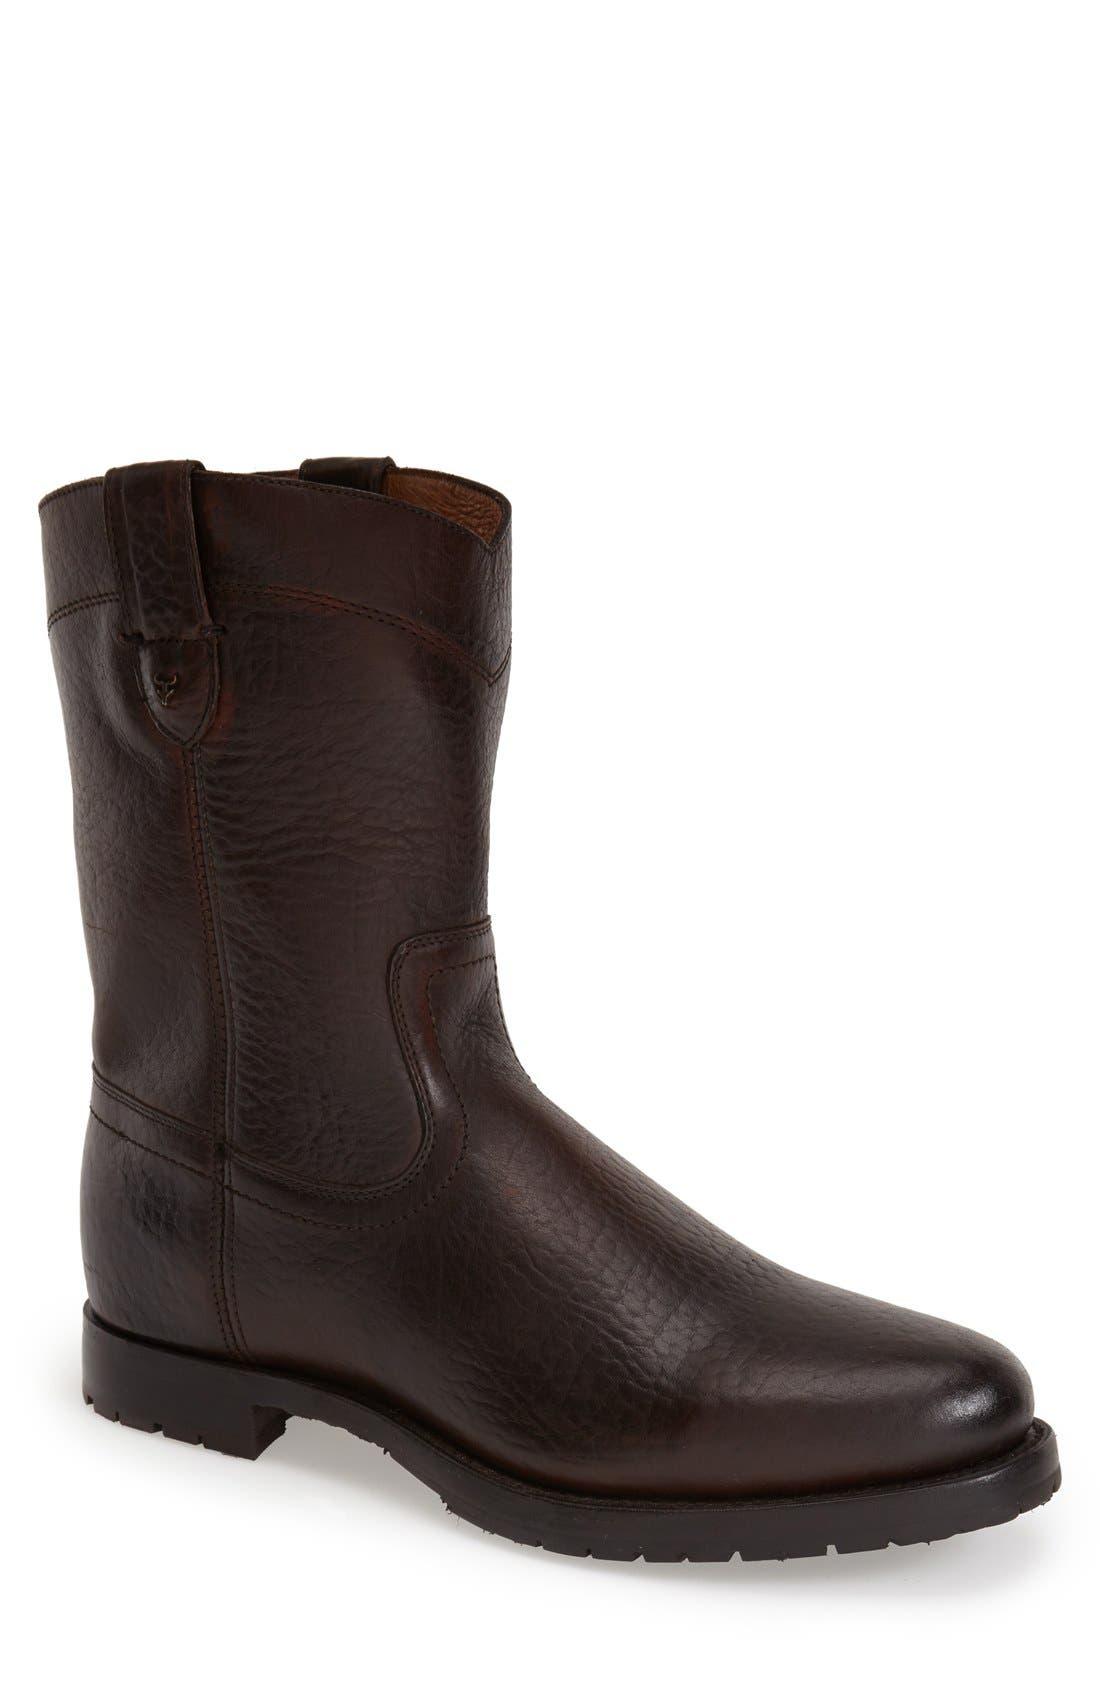 'Austin' Boot,                         Main,                         color,